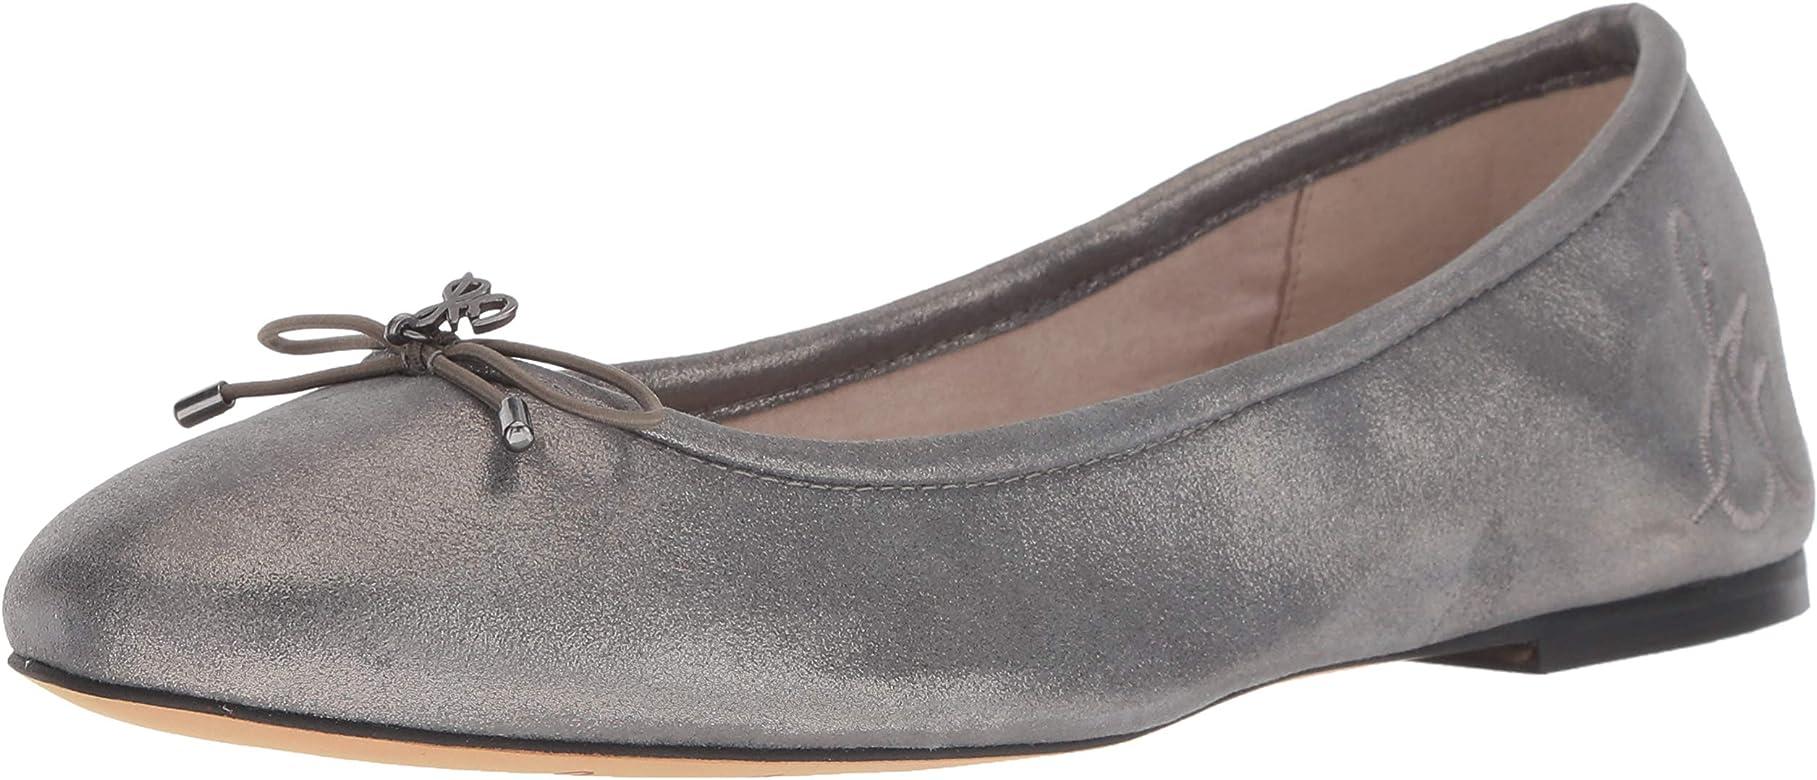 857675d56d3e Sam Edelman Women's Felicia Ballet Flat, Dark Pewter Metallic Leather, ...